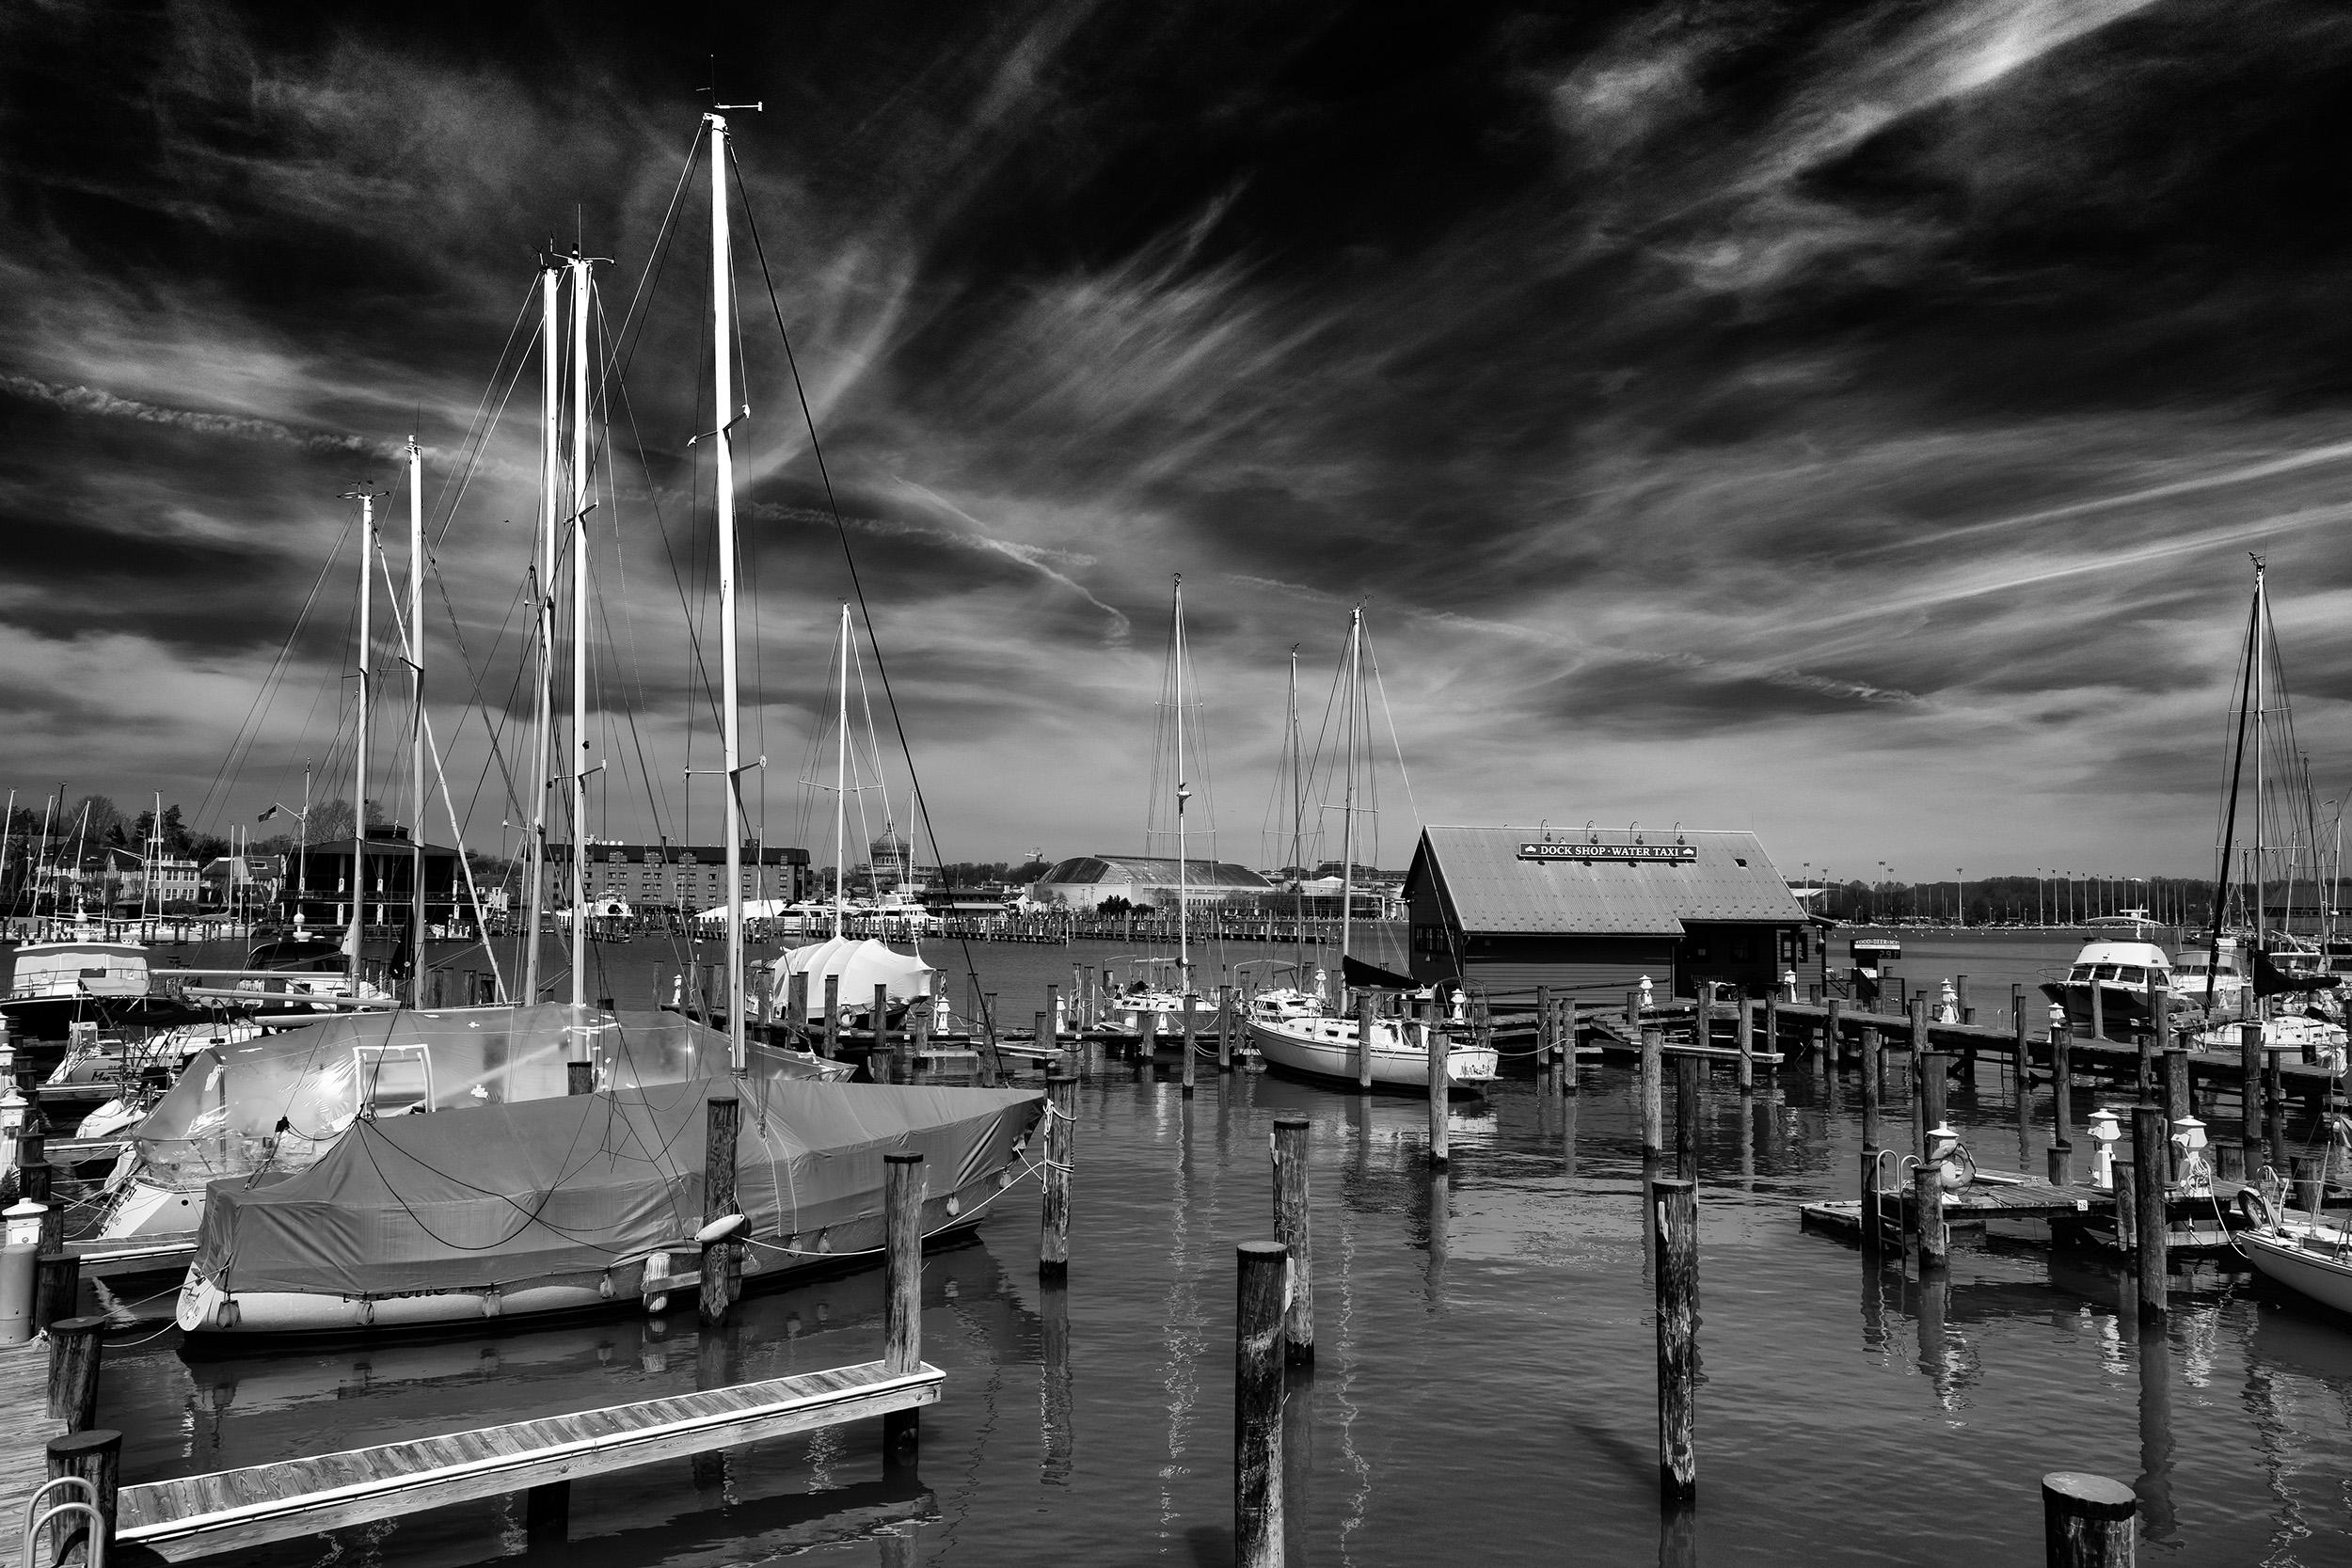 190327 Annapolis Maritime Museum 02-1 bw.jpg